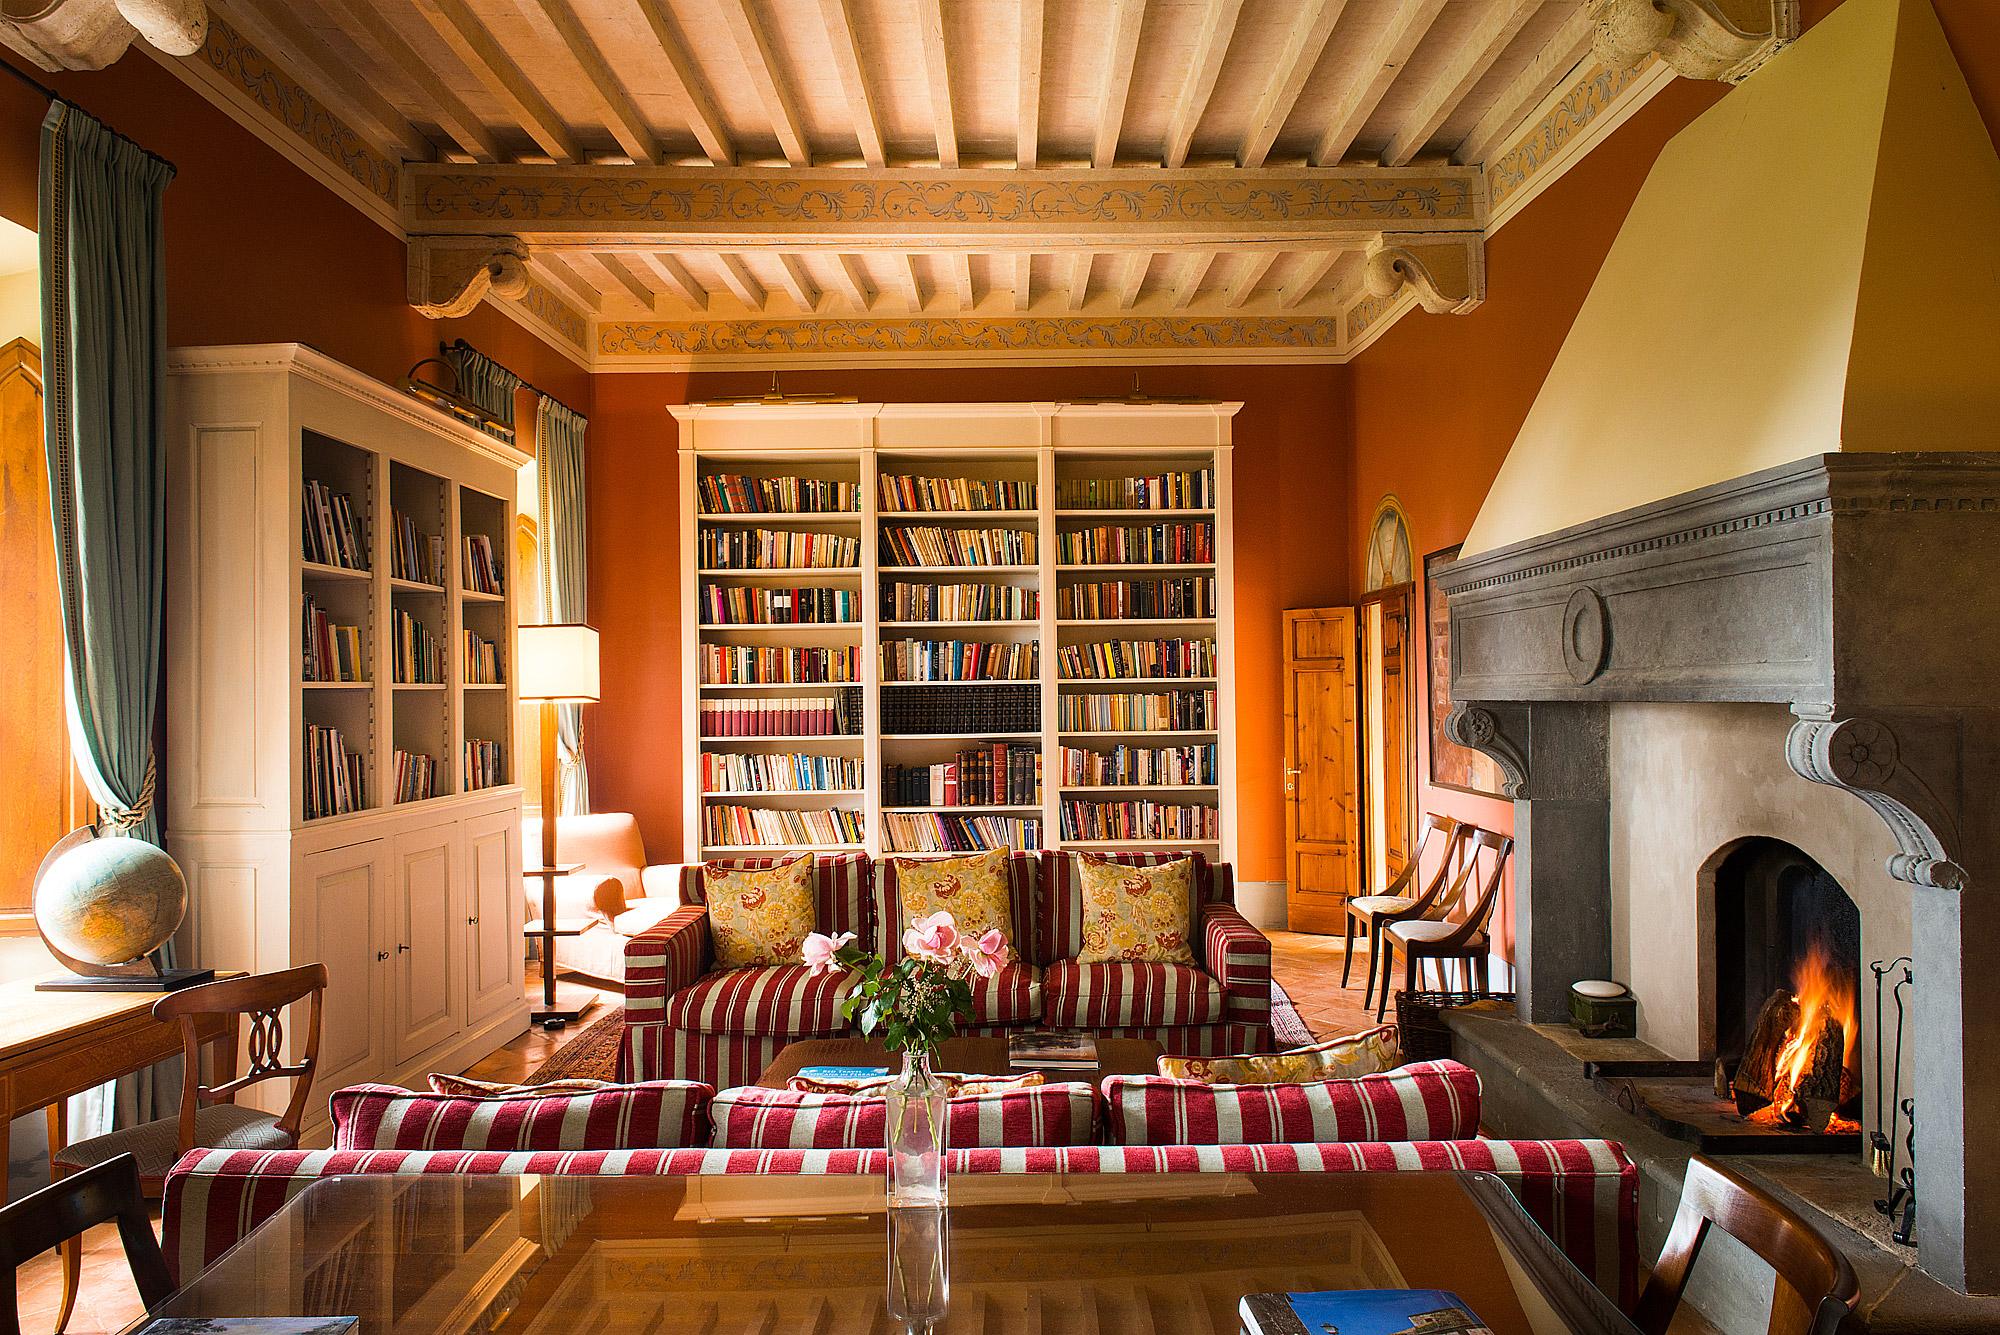 The Borgo Pignano library